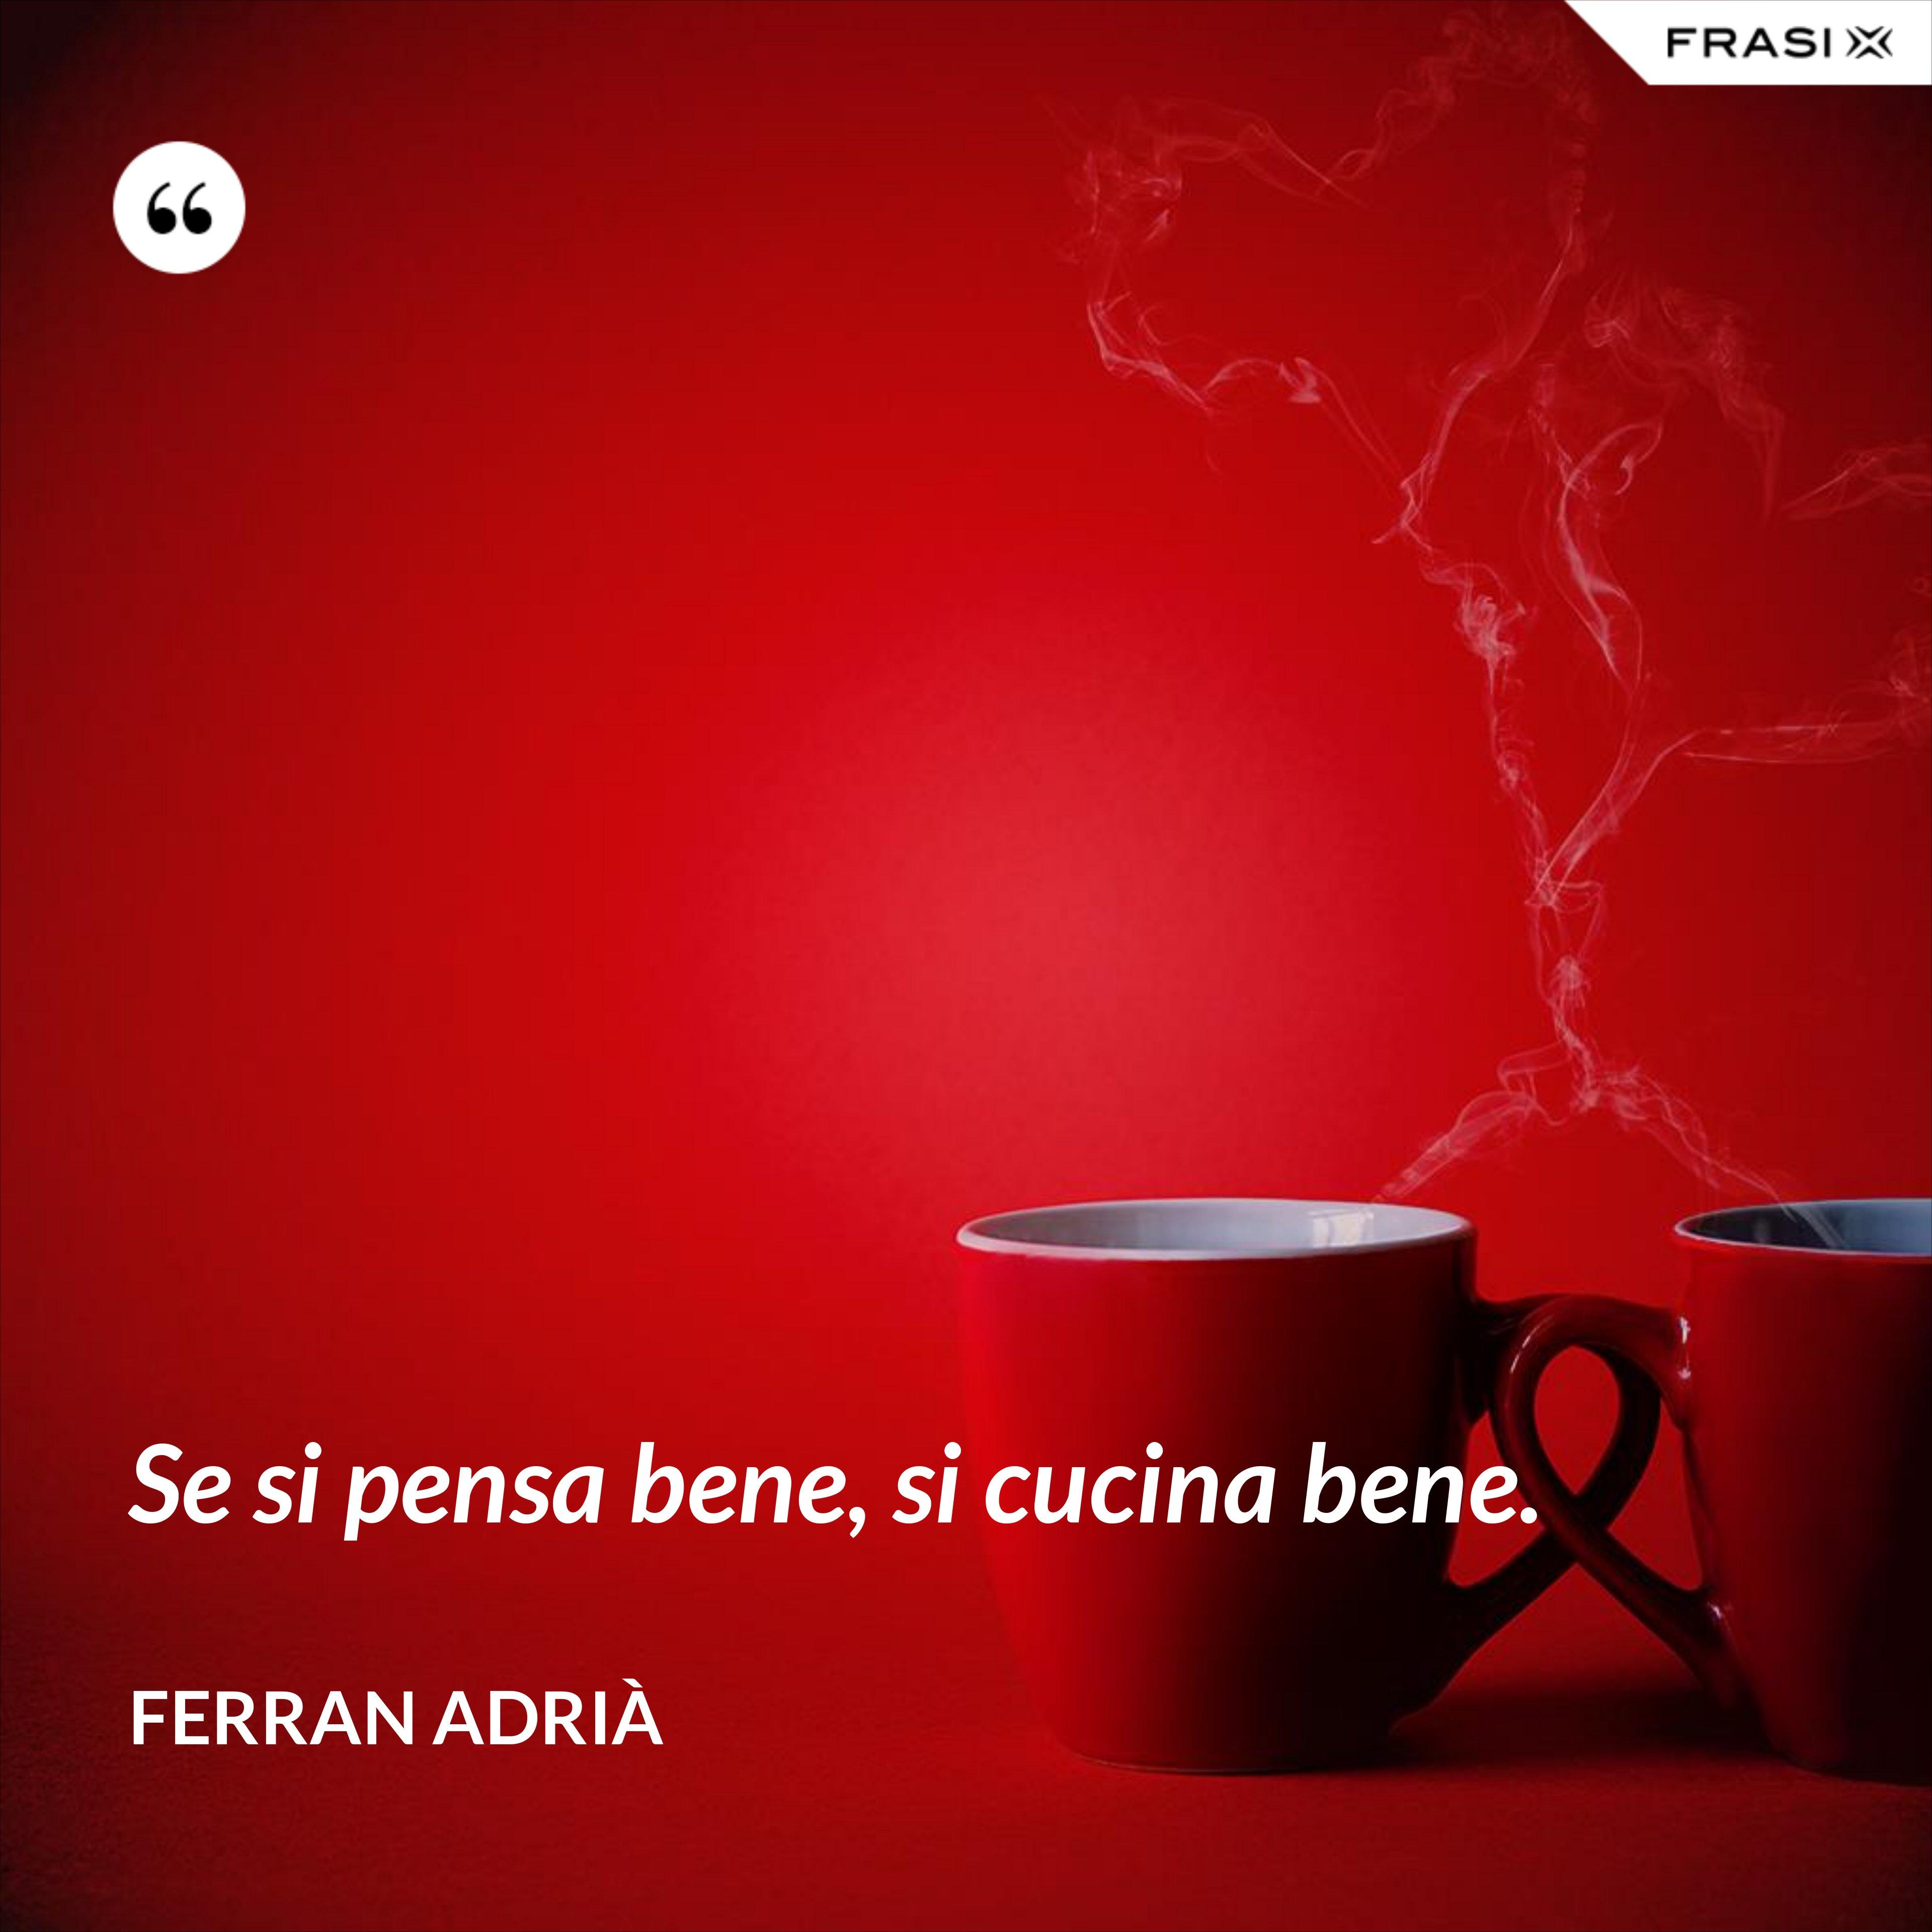 Se si pensa bene, si cucina bene. - Ferran Adrià